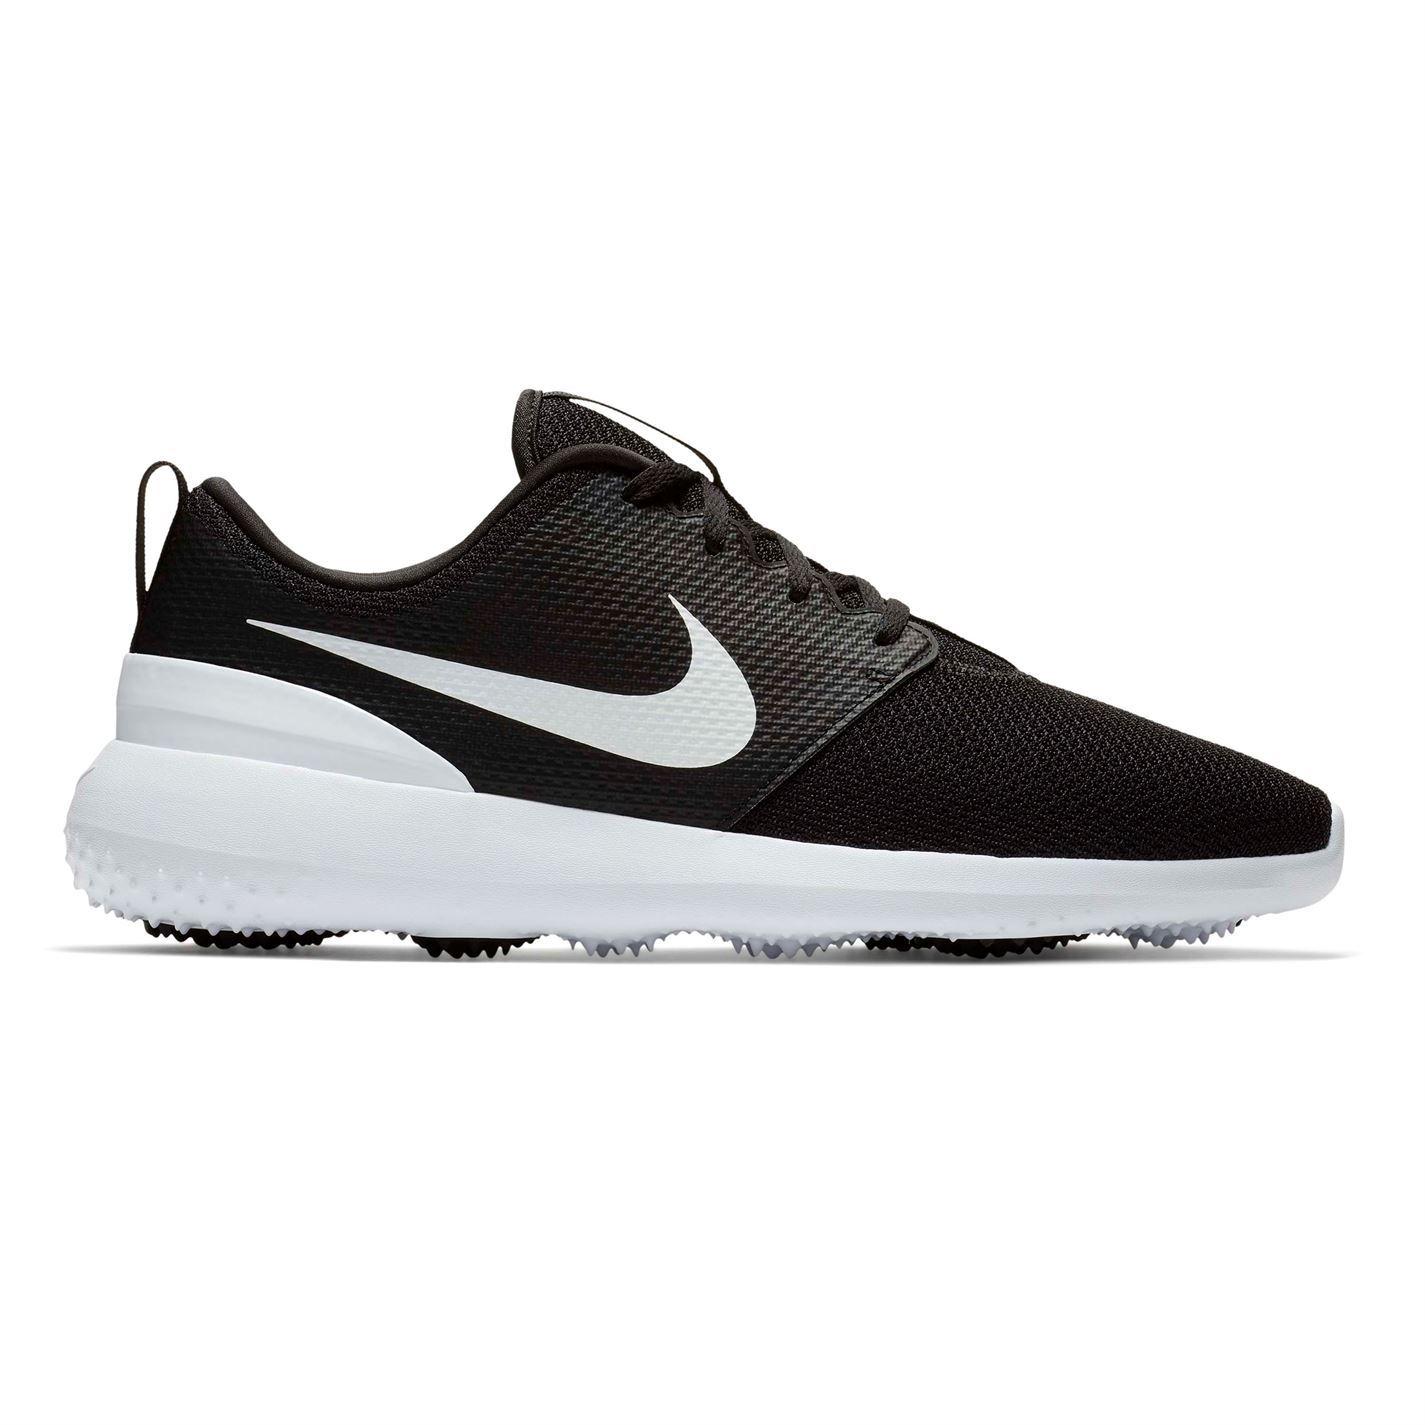 Nike-Roshe-Golf-Shoes-Mens-Spikeless-Footwear